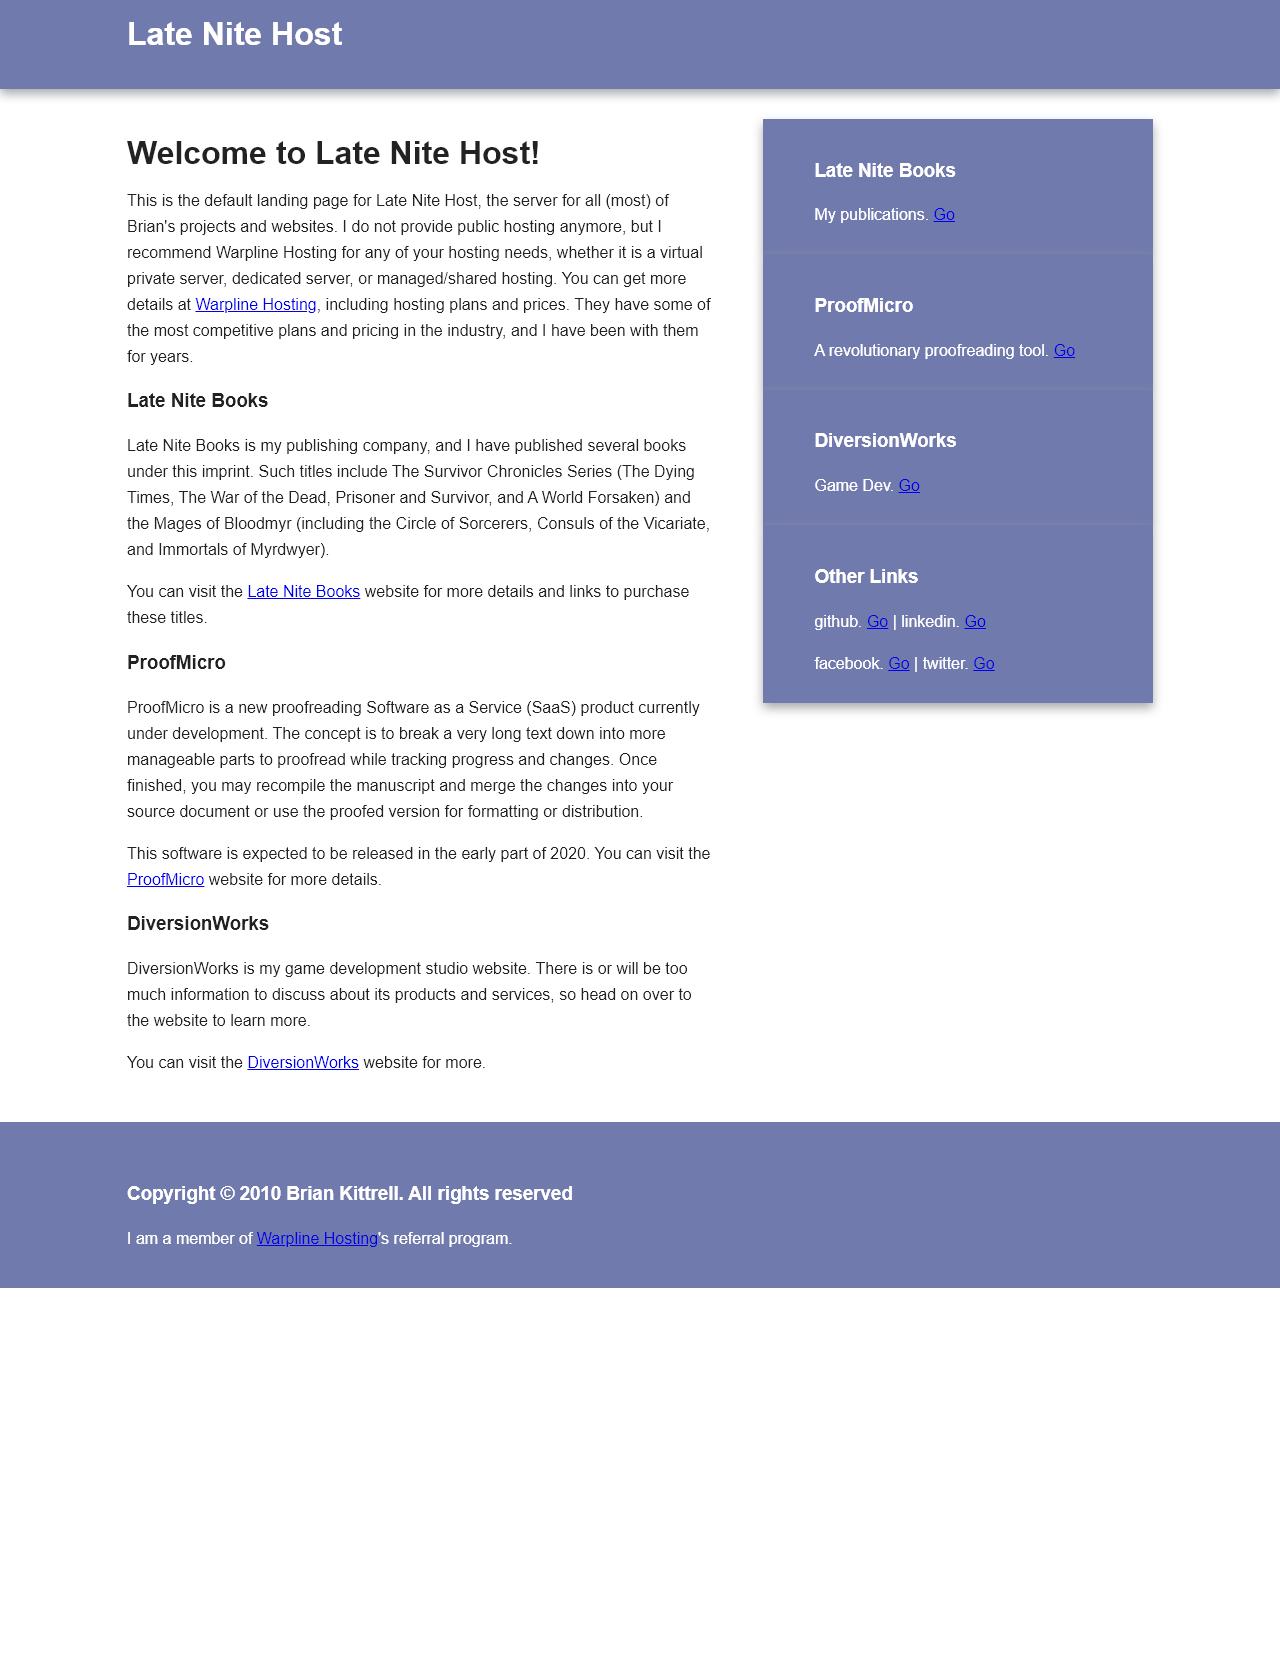 Screenshot Desktop - https://latenitehost.com/